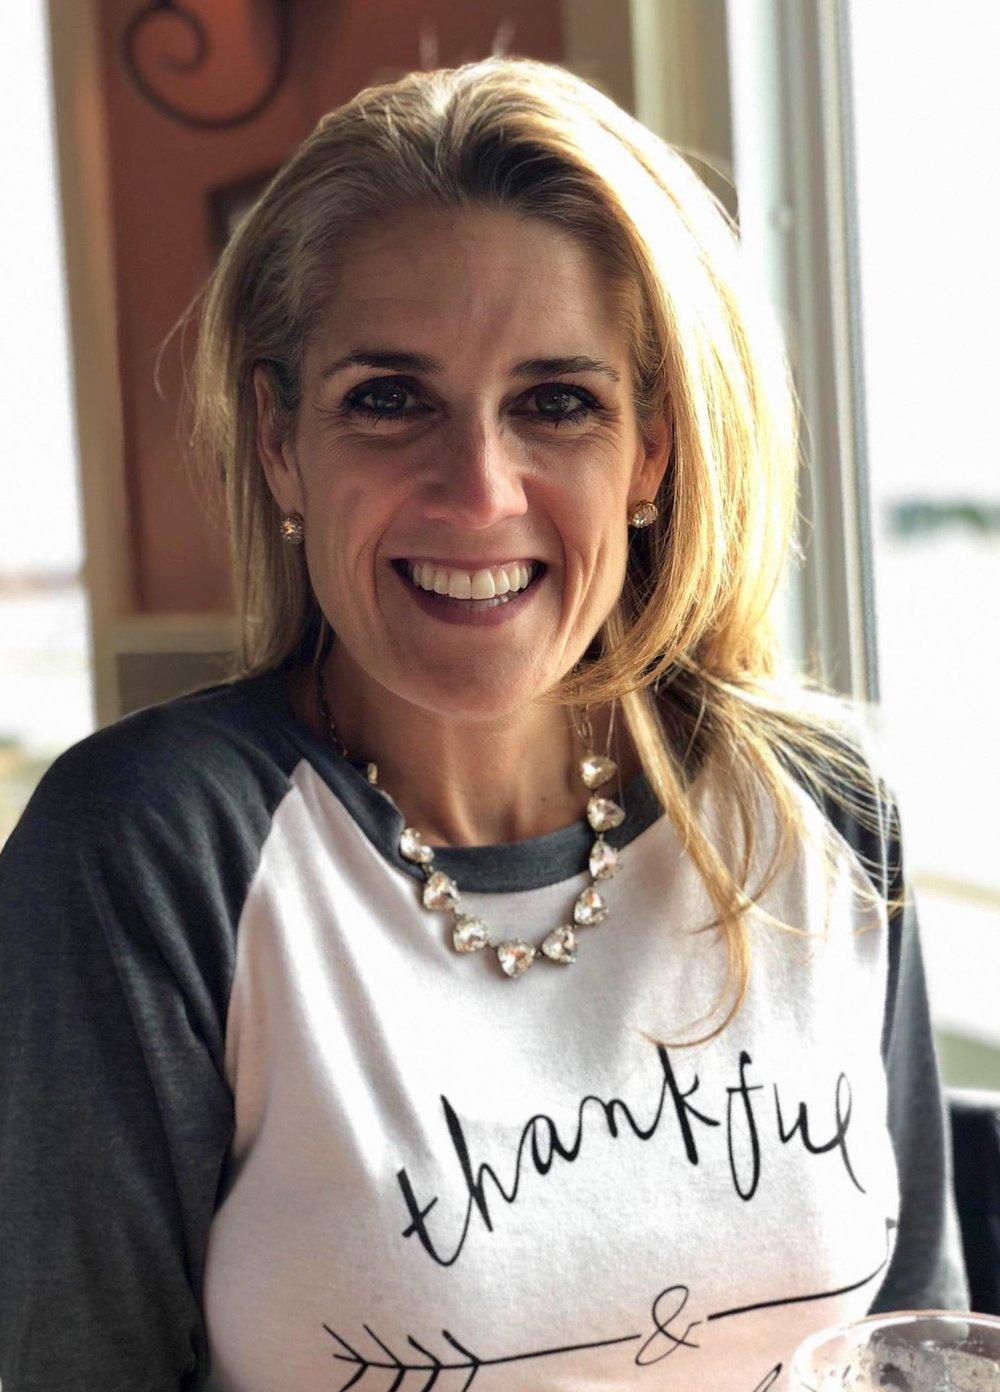 Janie Stockton Board Member at Large